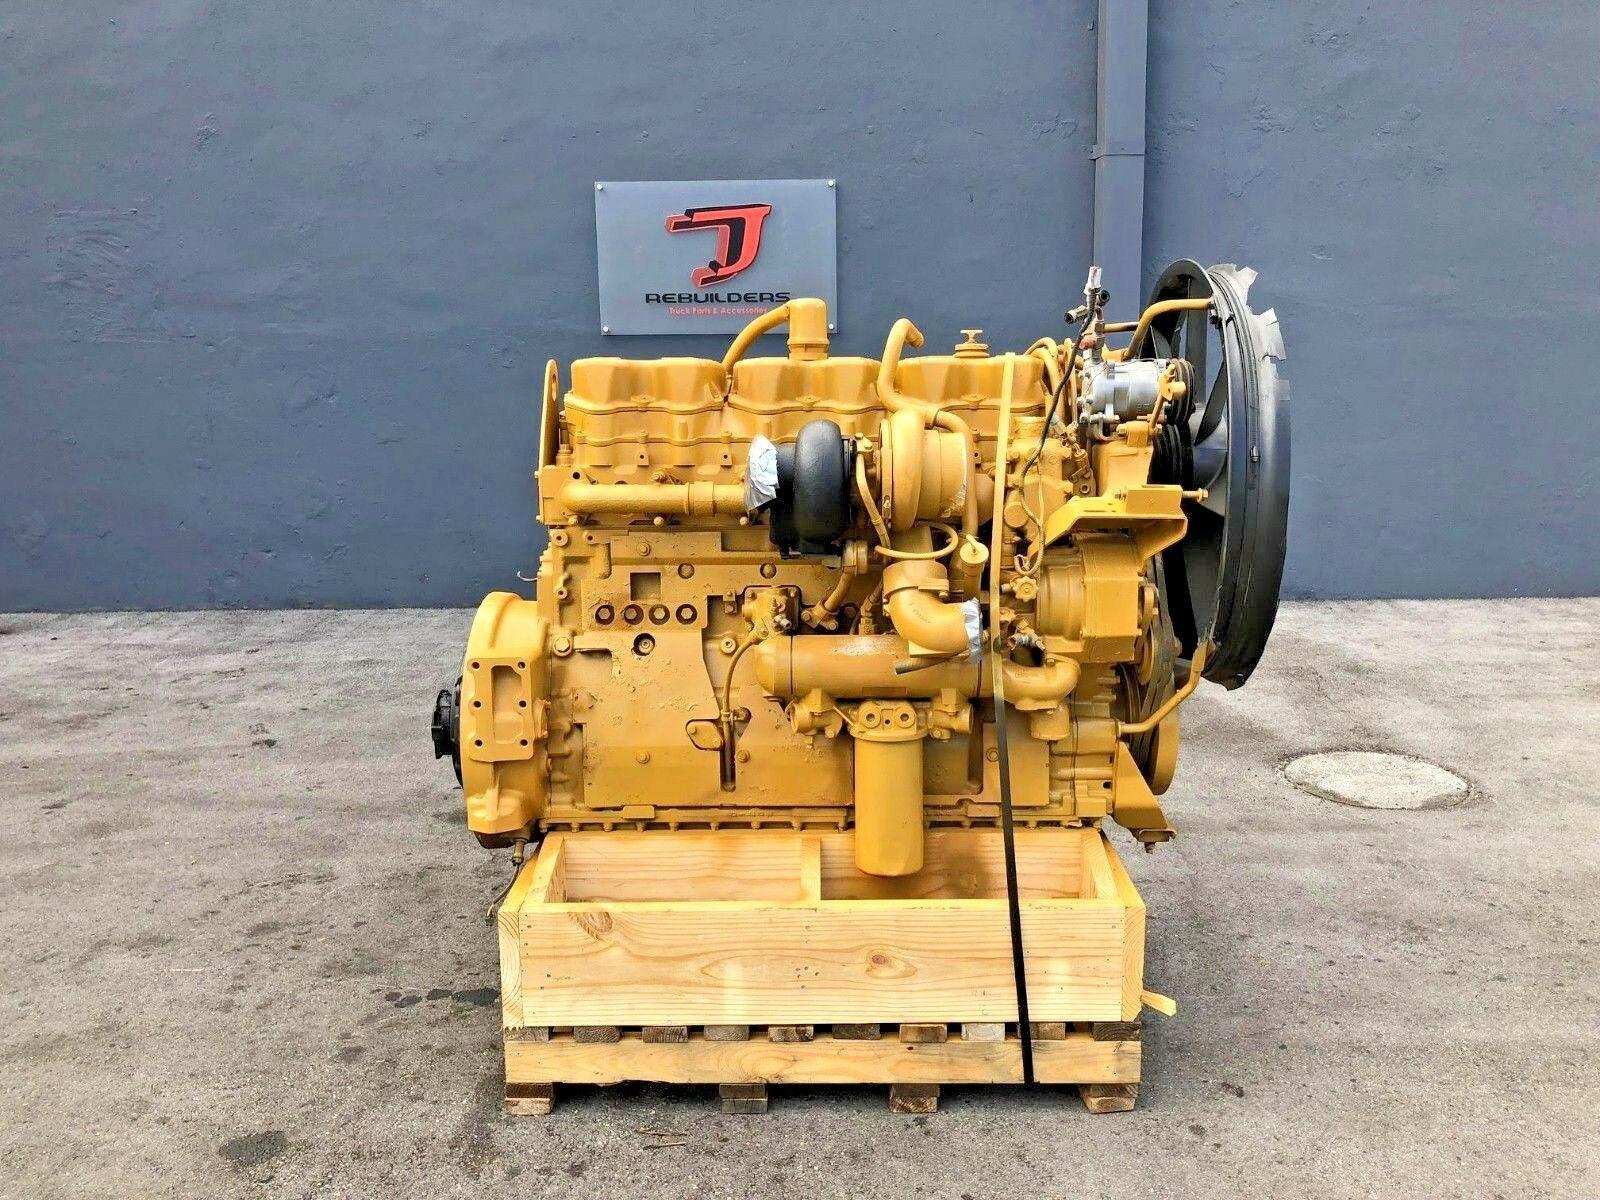 Caterpillar Diesel Engine Diesel engine, Diesel, Diesel